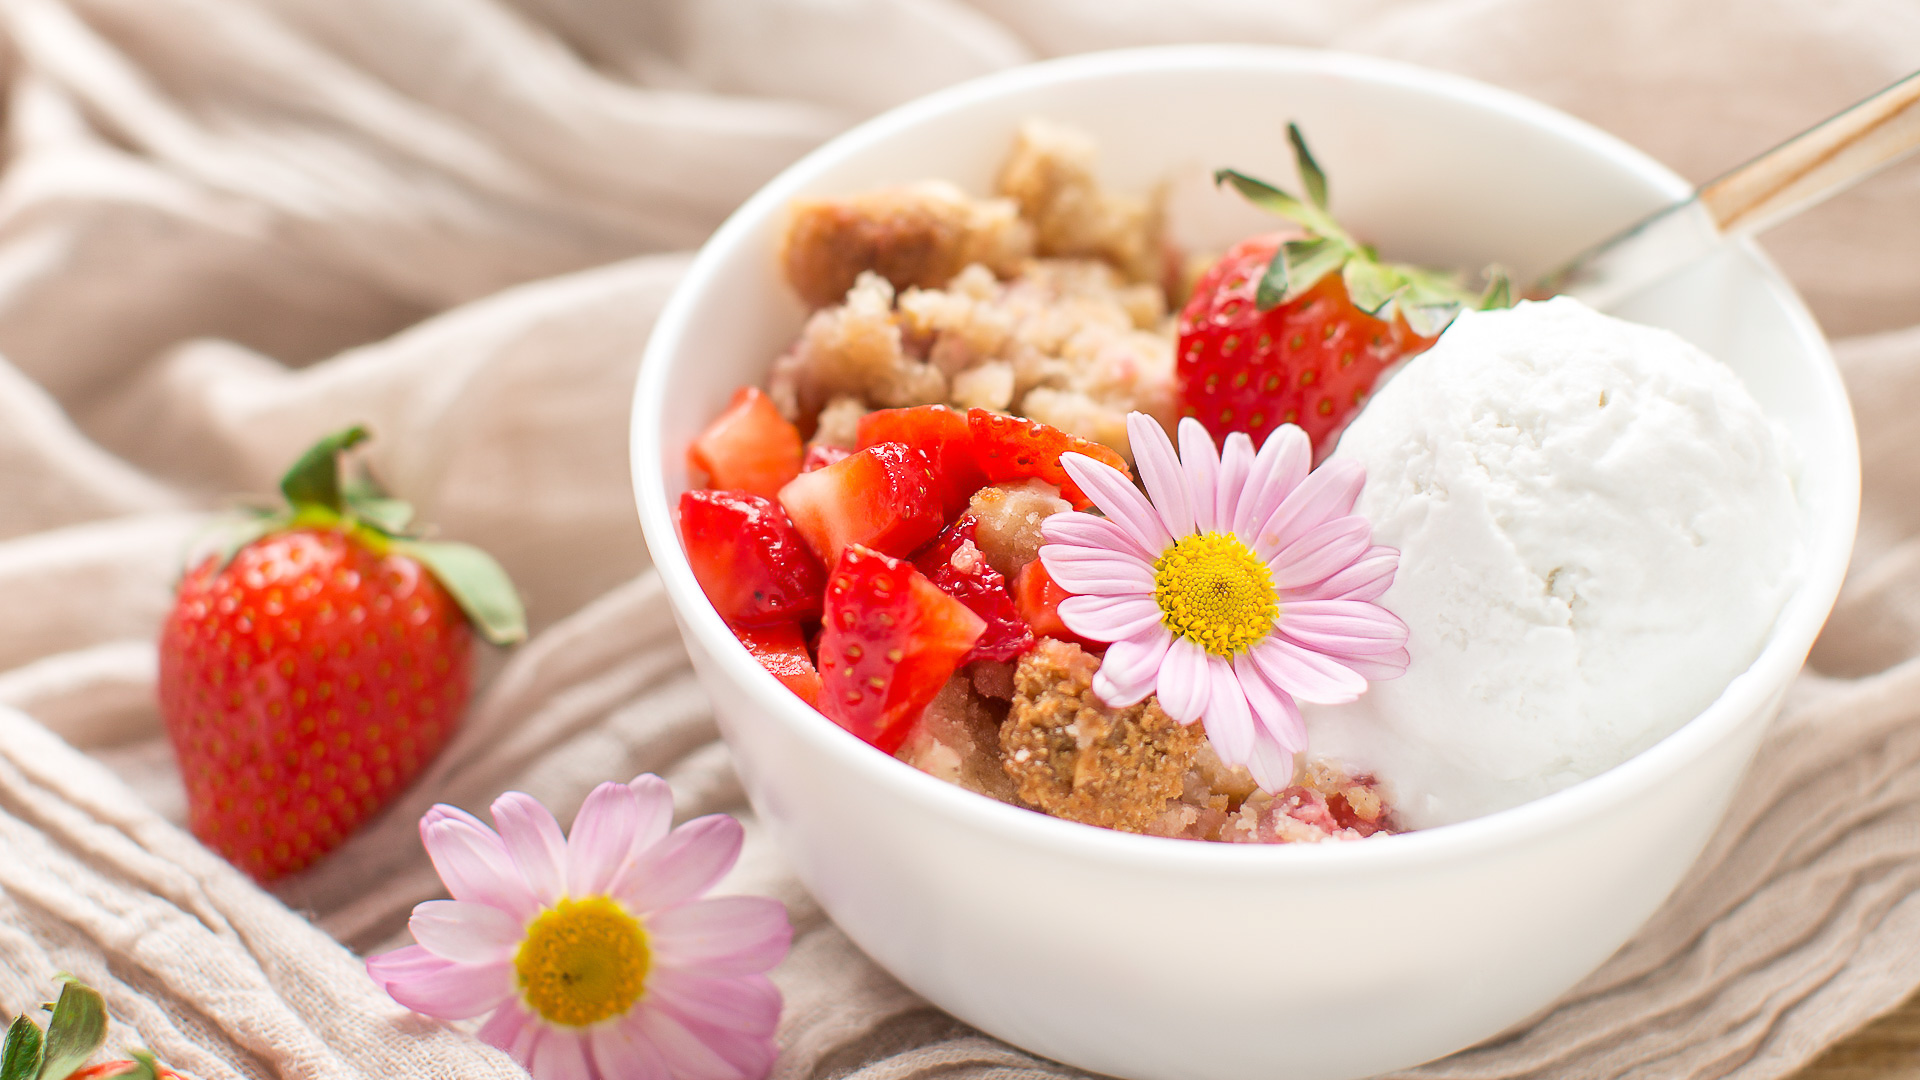 crumble di fragole e rabarbaro vegan senza glutine senza zucchero raffinato - vegan glutenfree rhubarb strawberry crisp refined sugar free